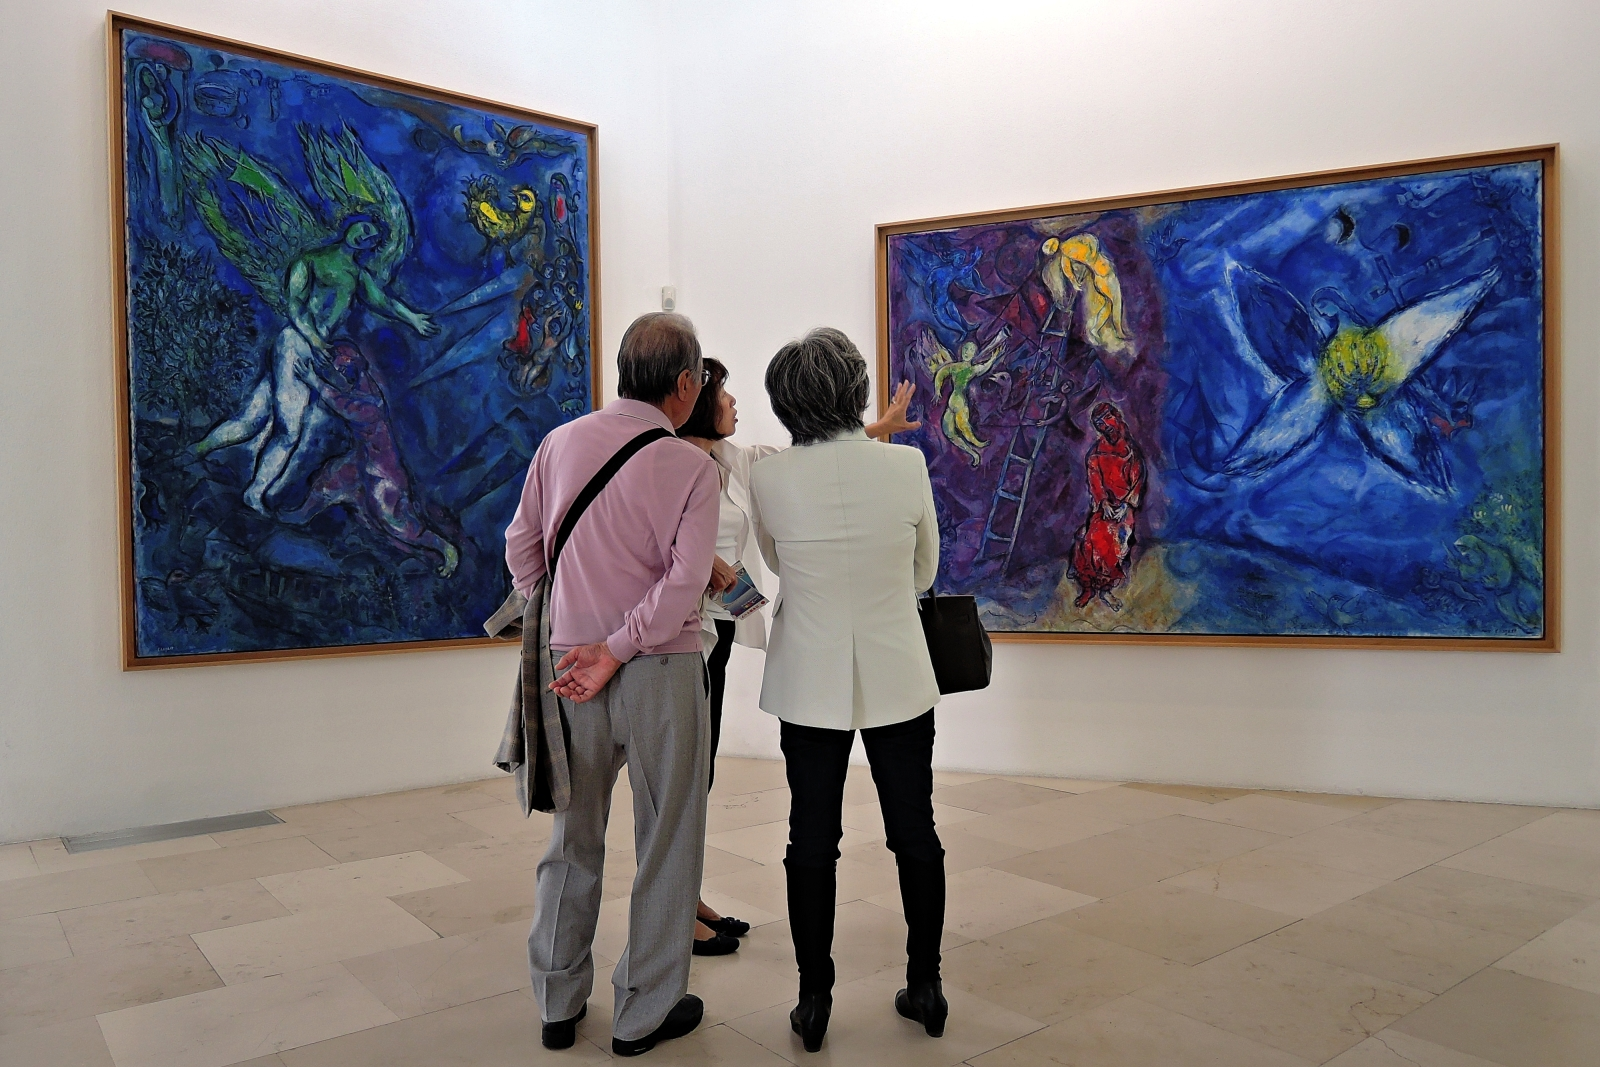 Национальный музей Марка Шагала, экспозиция